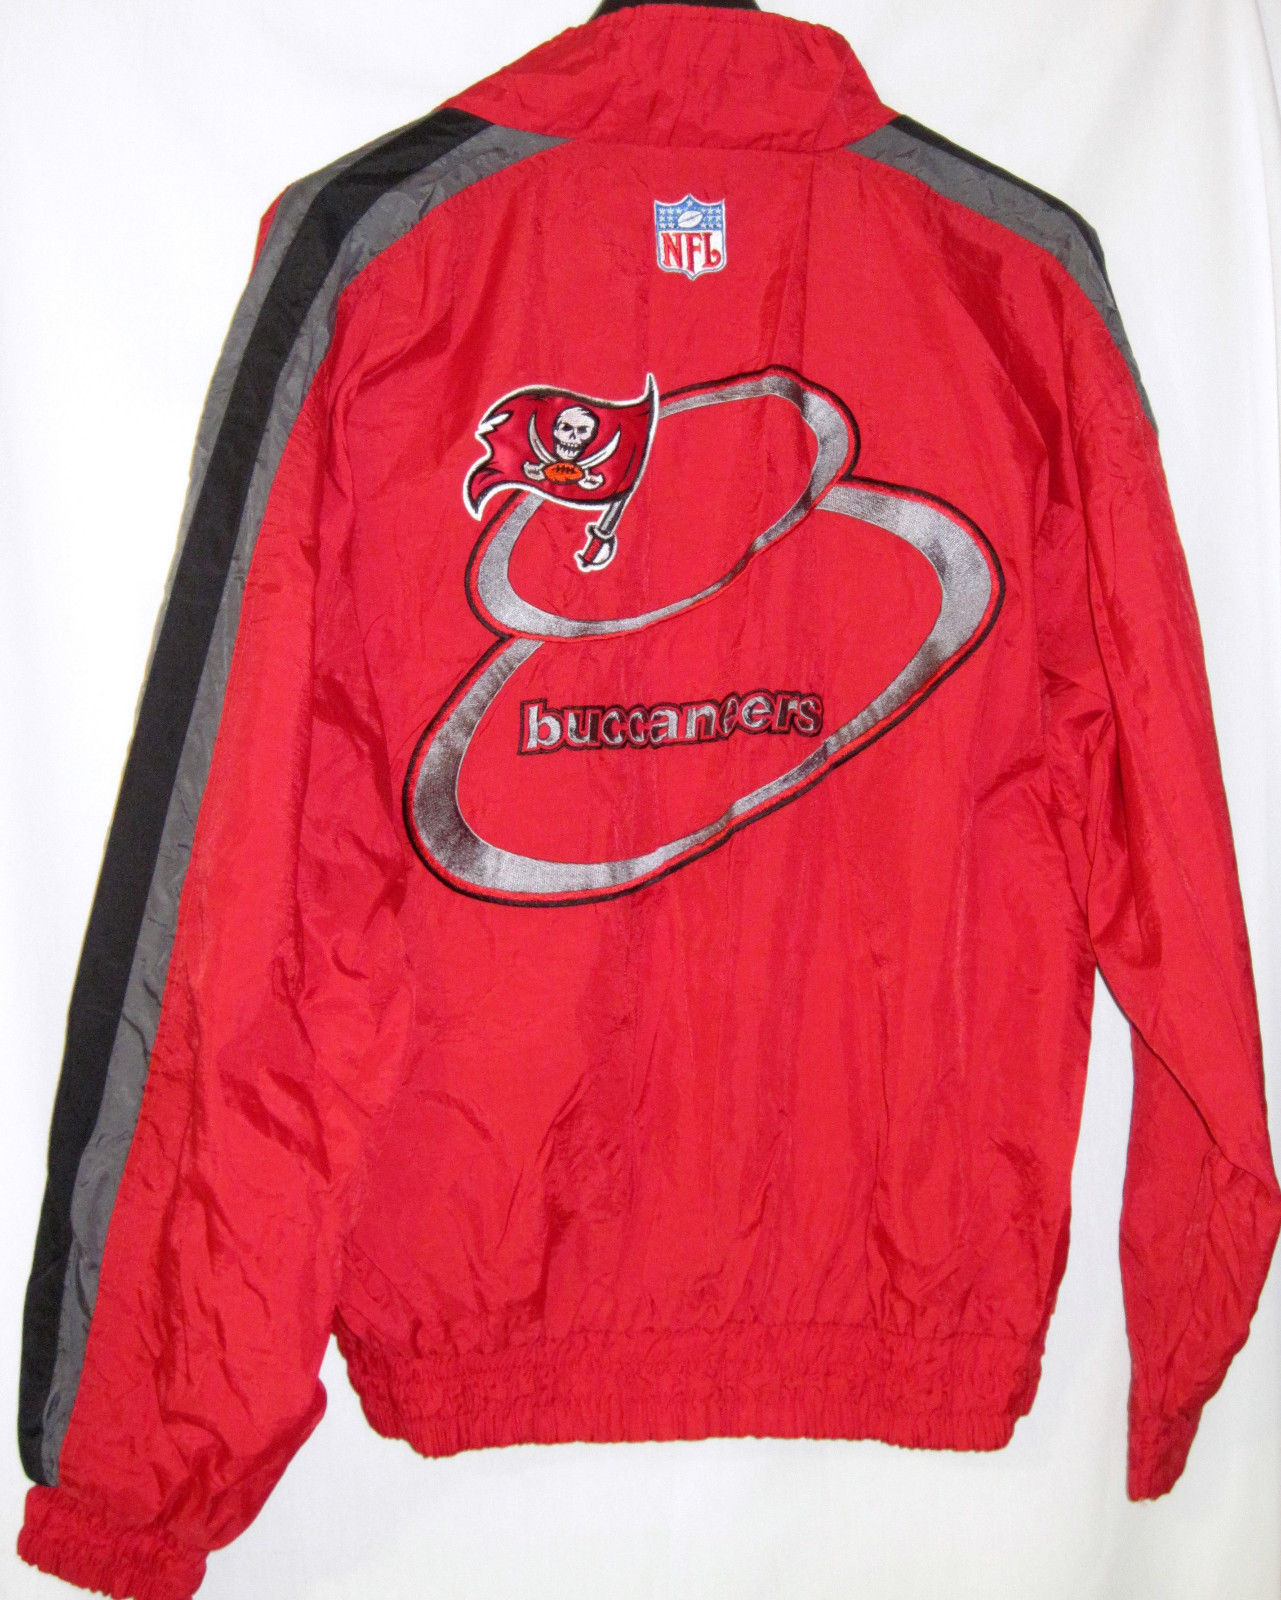 NFL Pro Line Authentic Logo AthleticTampa Bay Buccaneers nylon jacket Zip Up L image 6